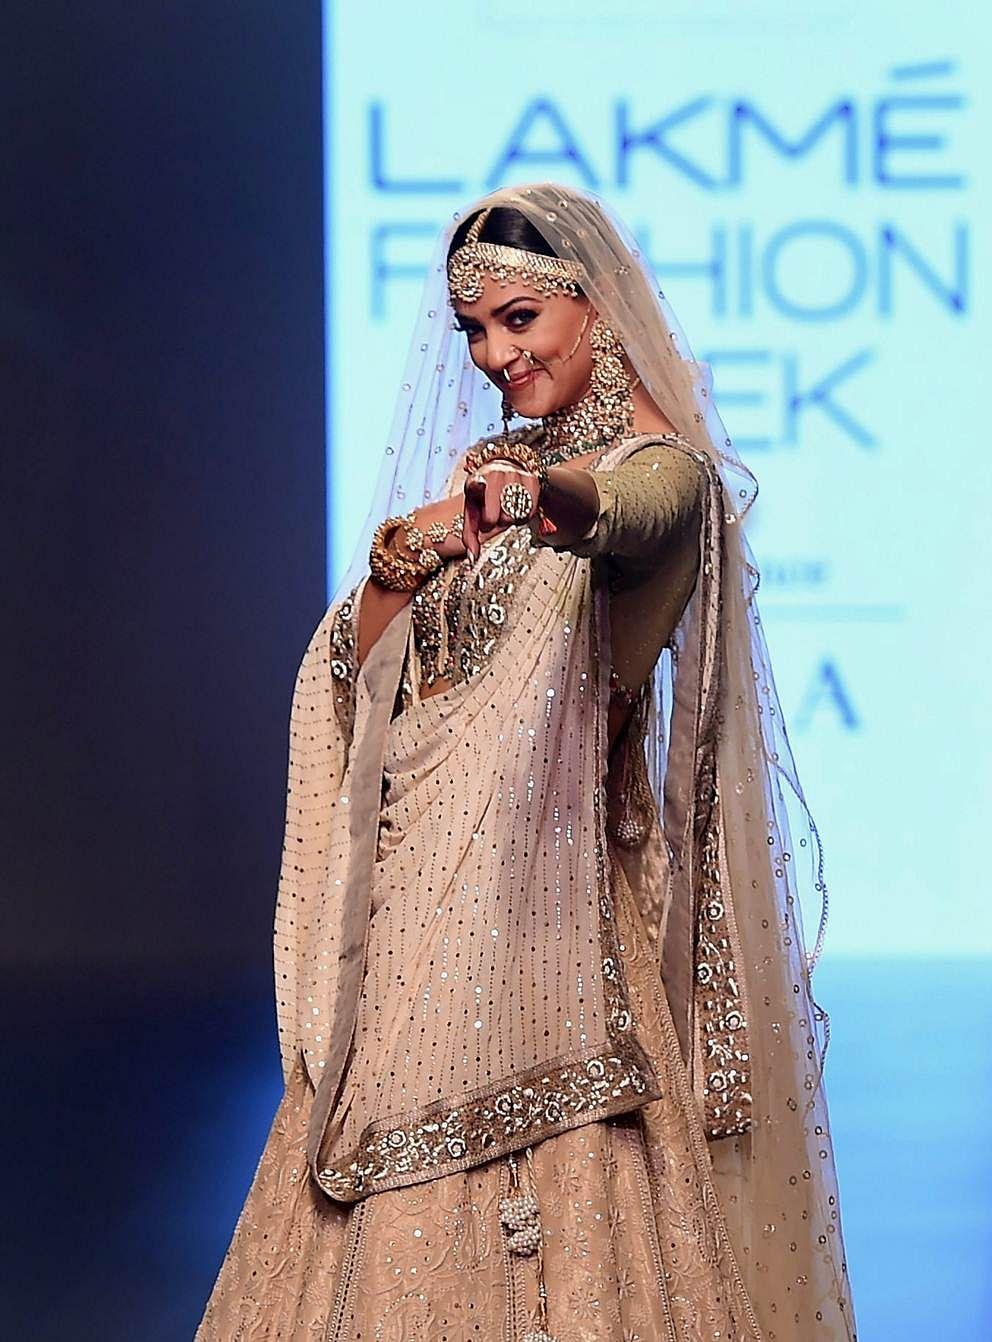 Mumbai: Bollywood actor Sushmita Sen walks the ramp displaying the collection of designers Muzaffar and Meera Ali at Lakme Fashion Week Summer Resort 2018 Mumbai, on Saturday. PTI Photo by Mitesh Bhuvad (PTI2_3_2018_000162B)